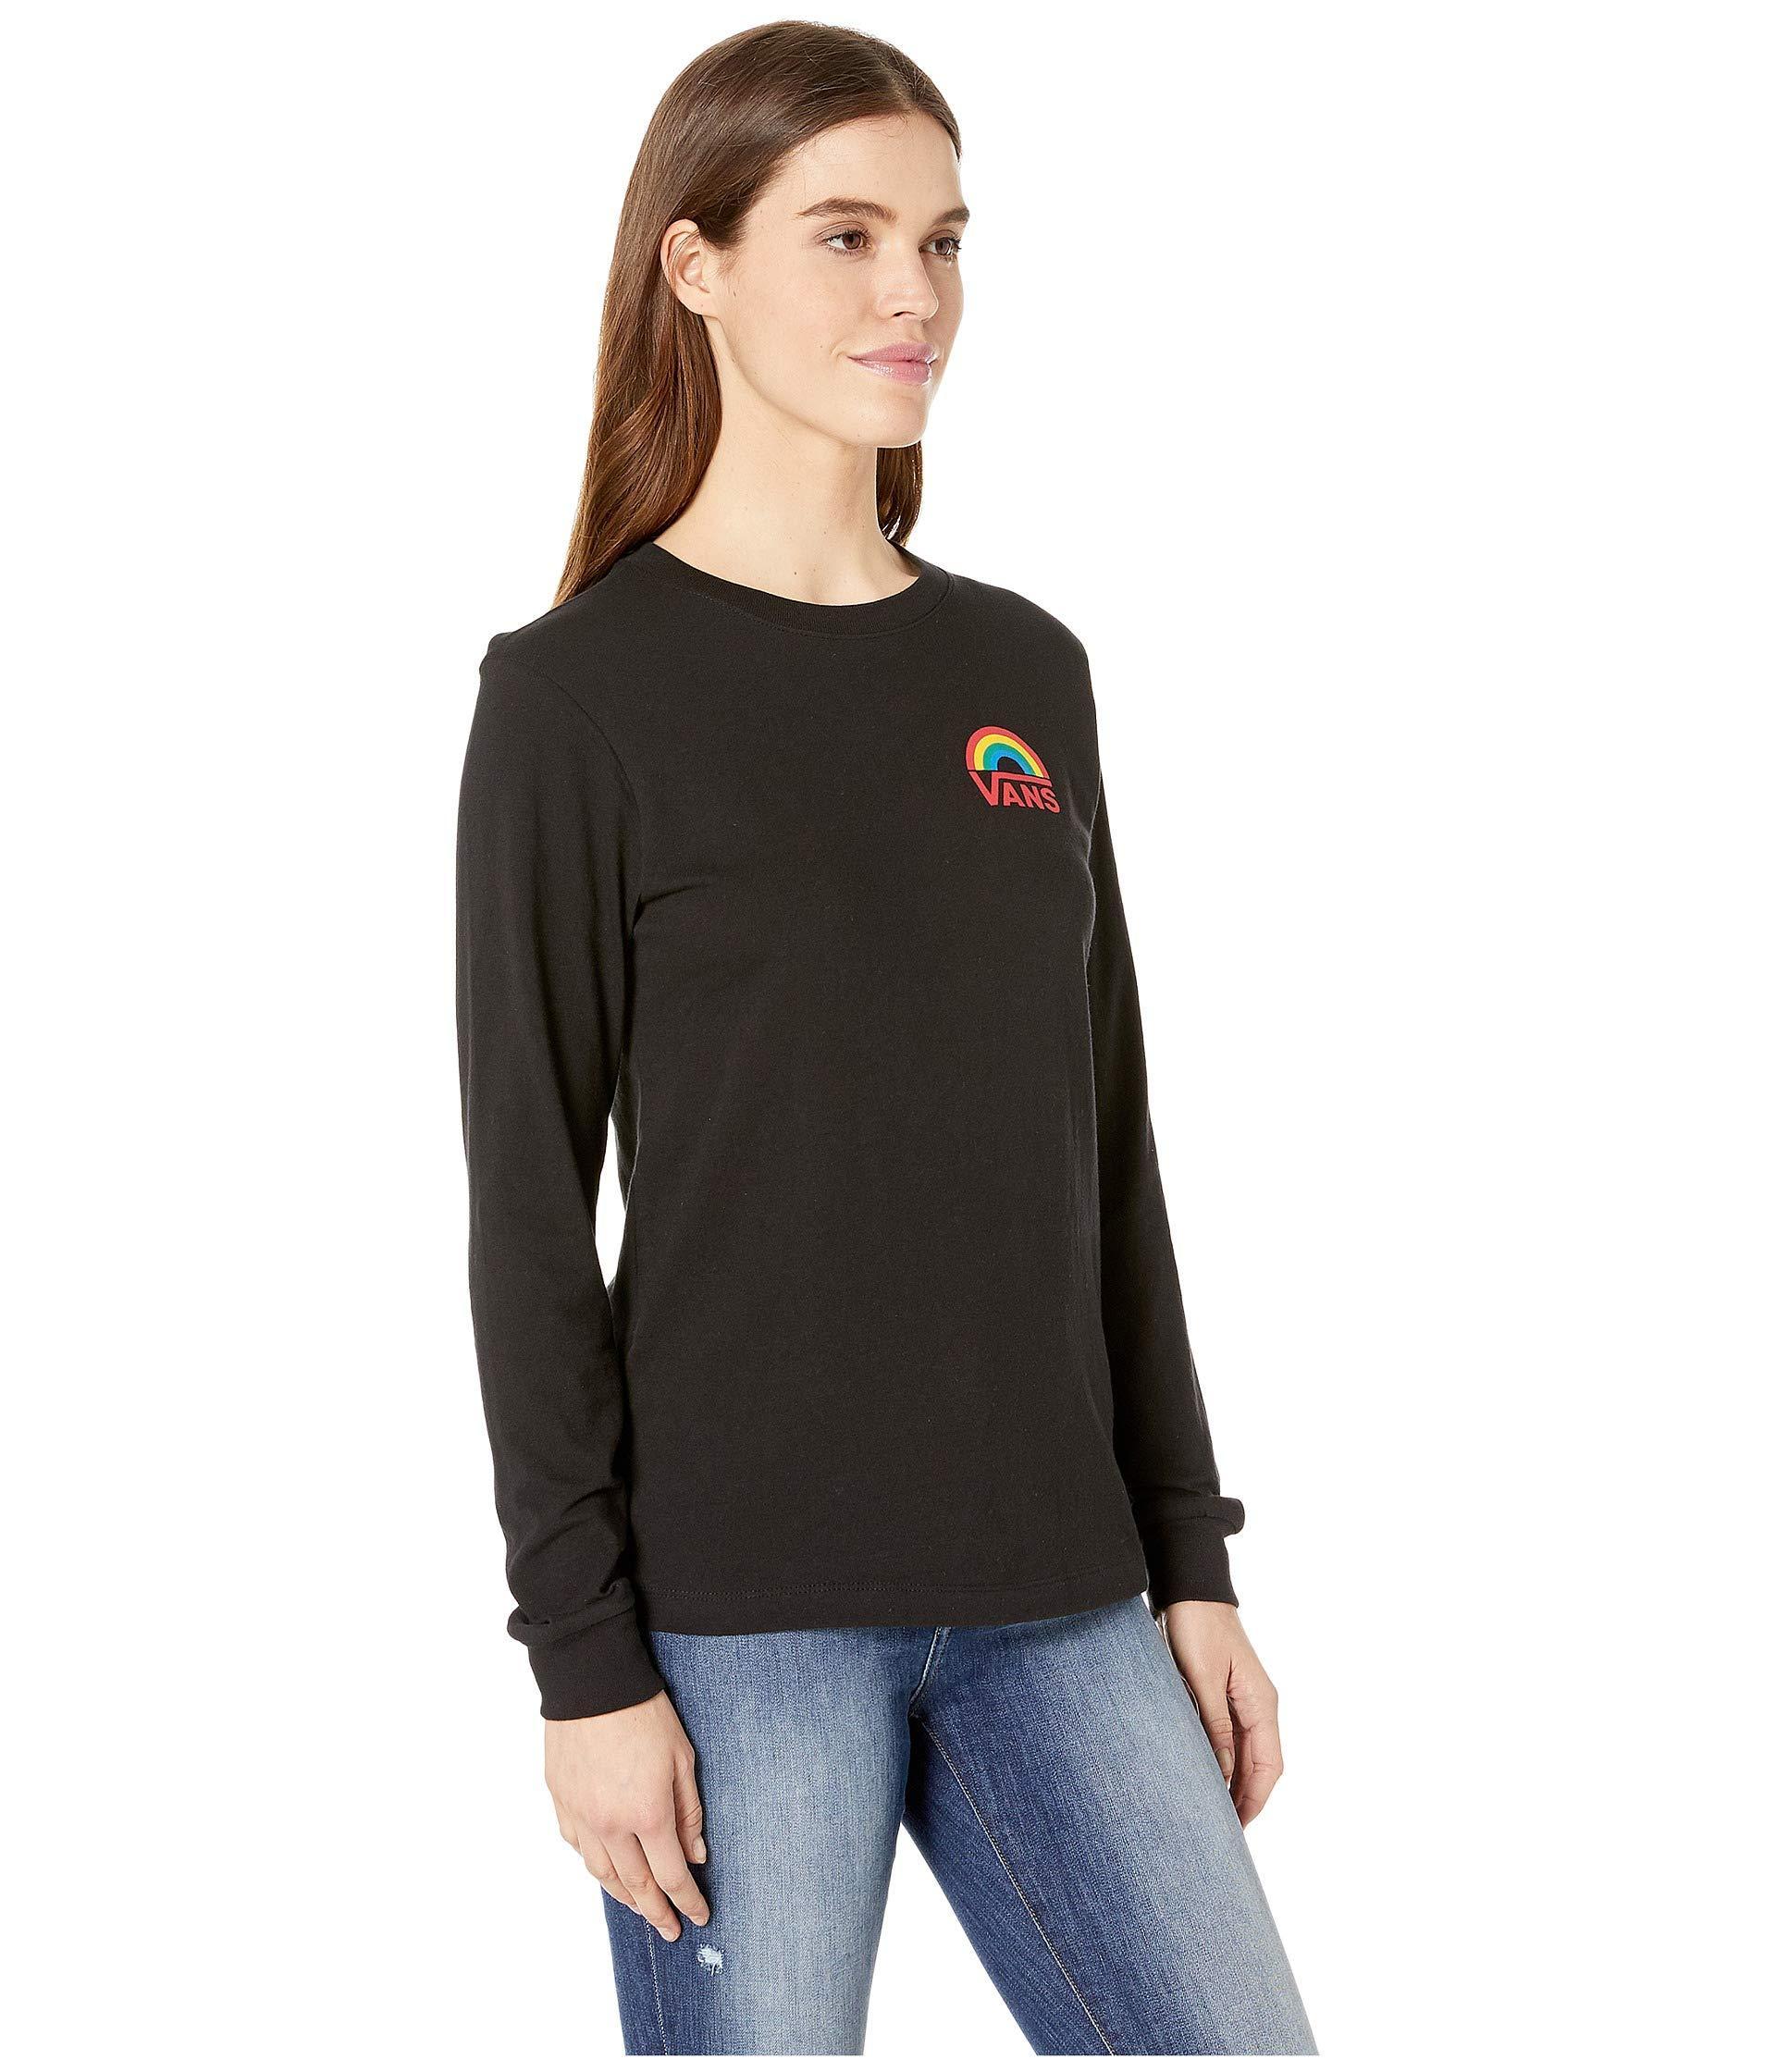 af51a65917b7 Lyst - Vans Make It Rainbow Long Sleeve (black) Women s Clothing in ...